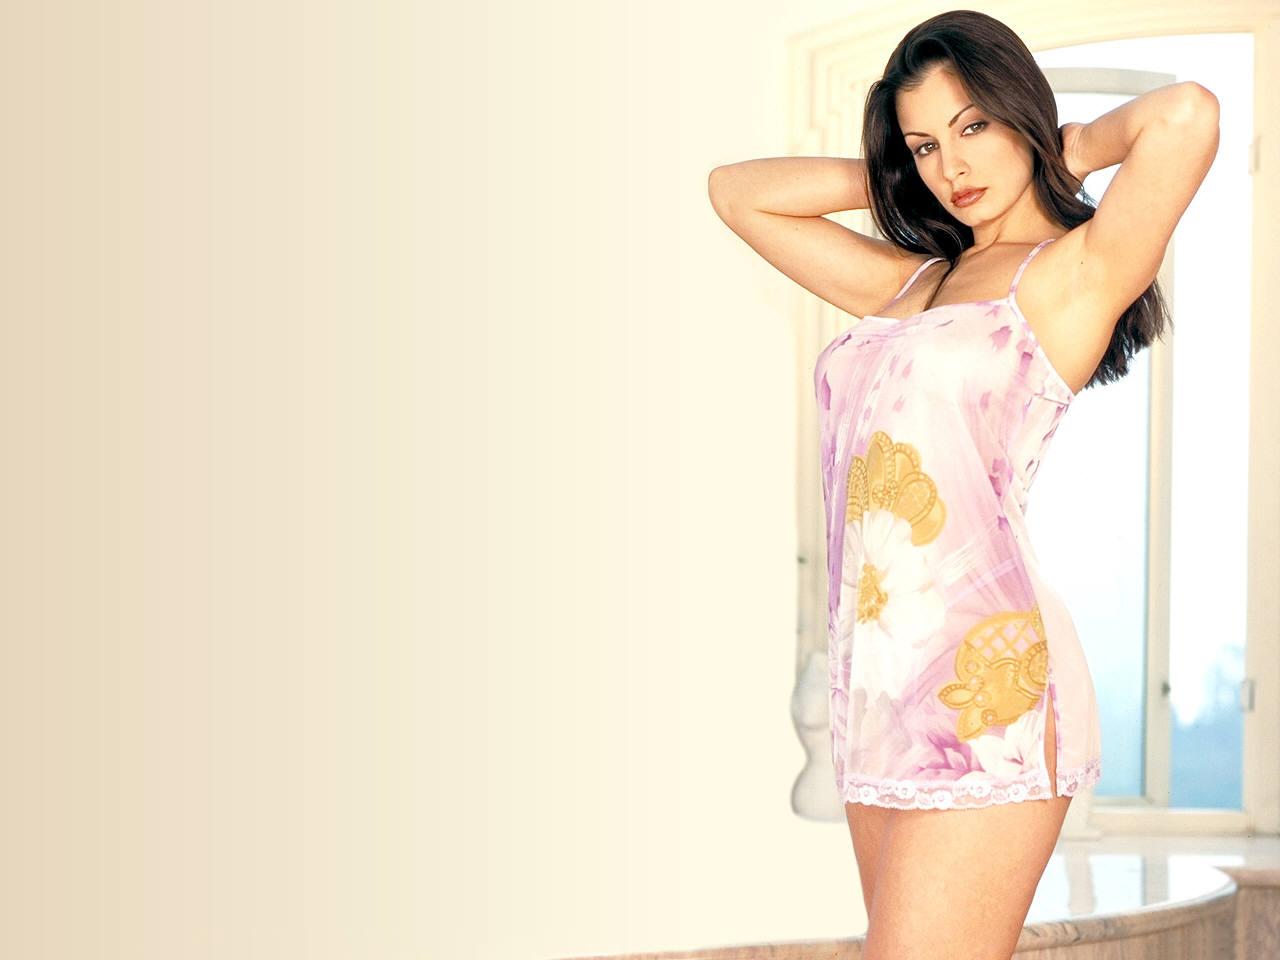 Фото ариа джовани, Aria Giovanni - все порно и секс фото модели 2 фотография